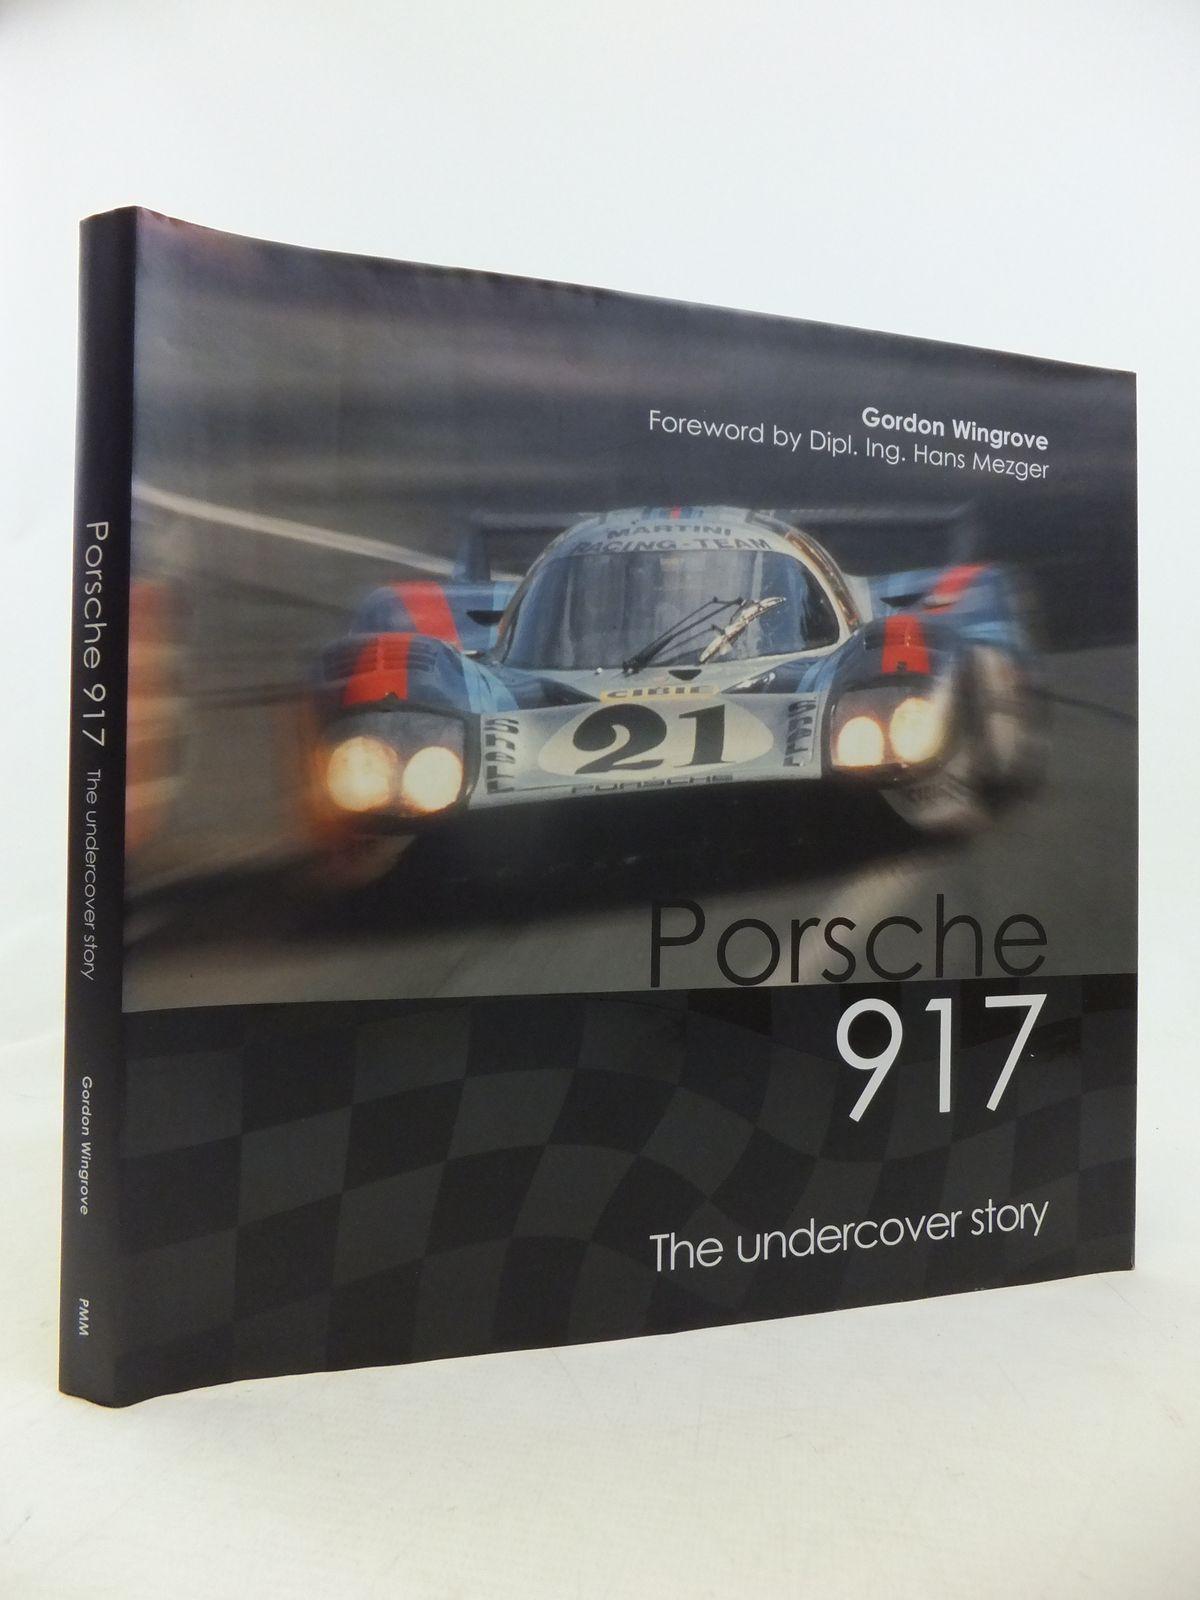 Porsche 917 The Undercover Story